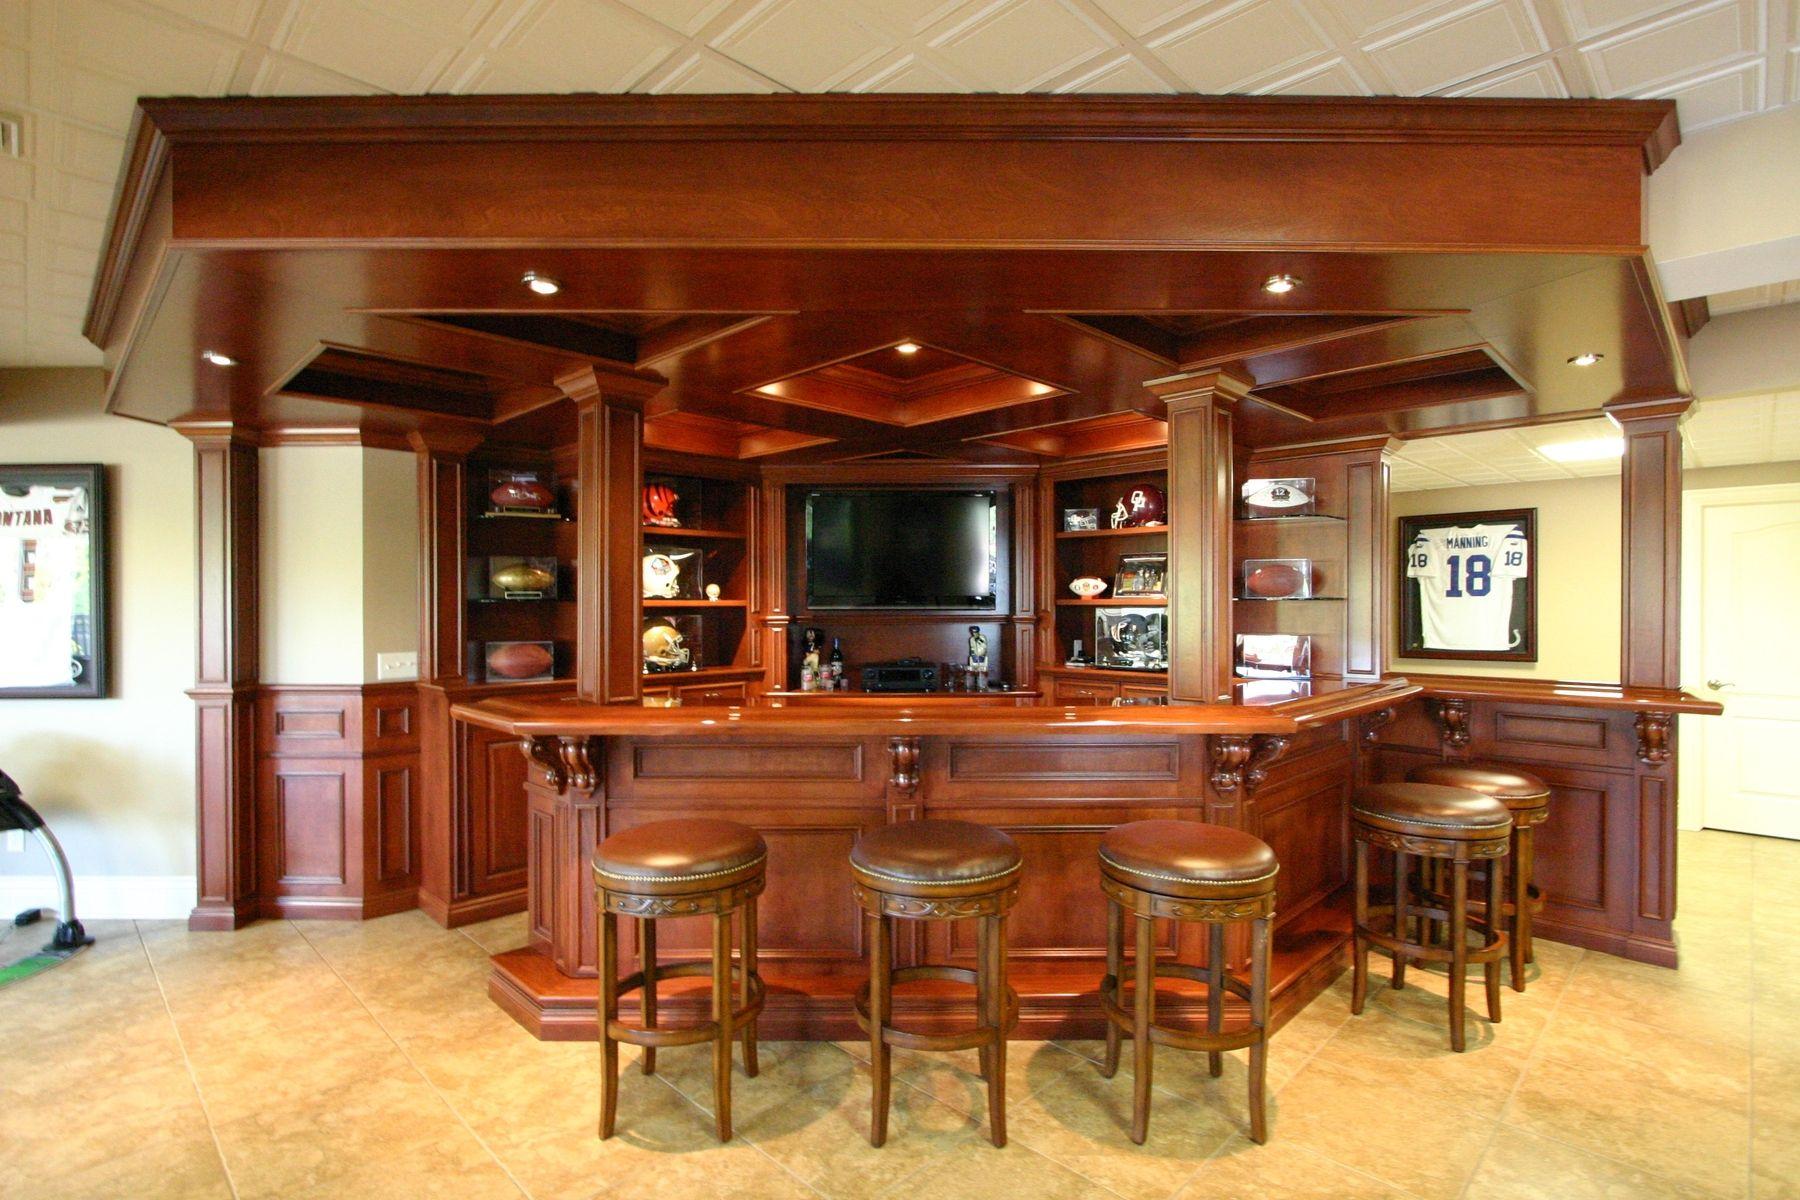 Stunning Custom Bar Design Ideas Images - Interior Design Ideas ...